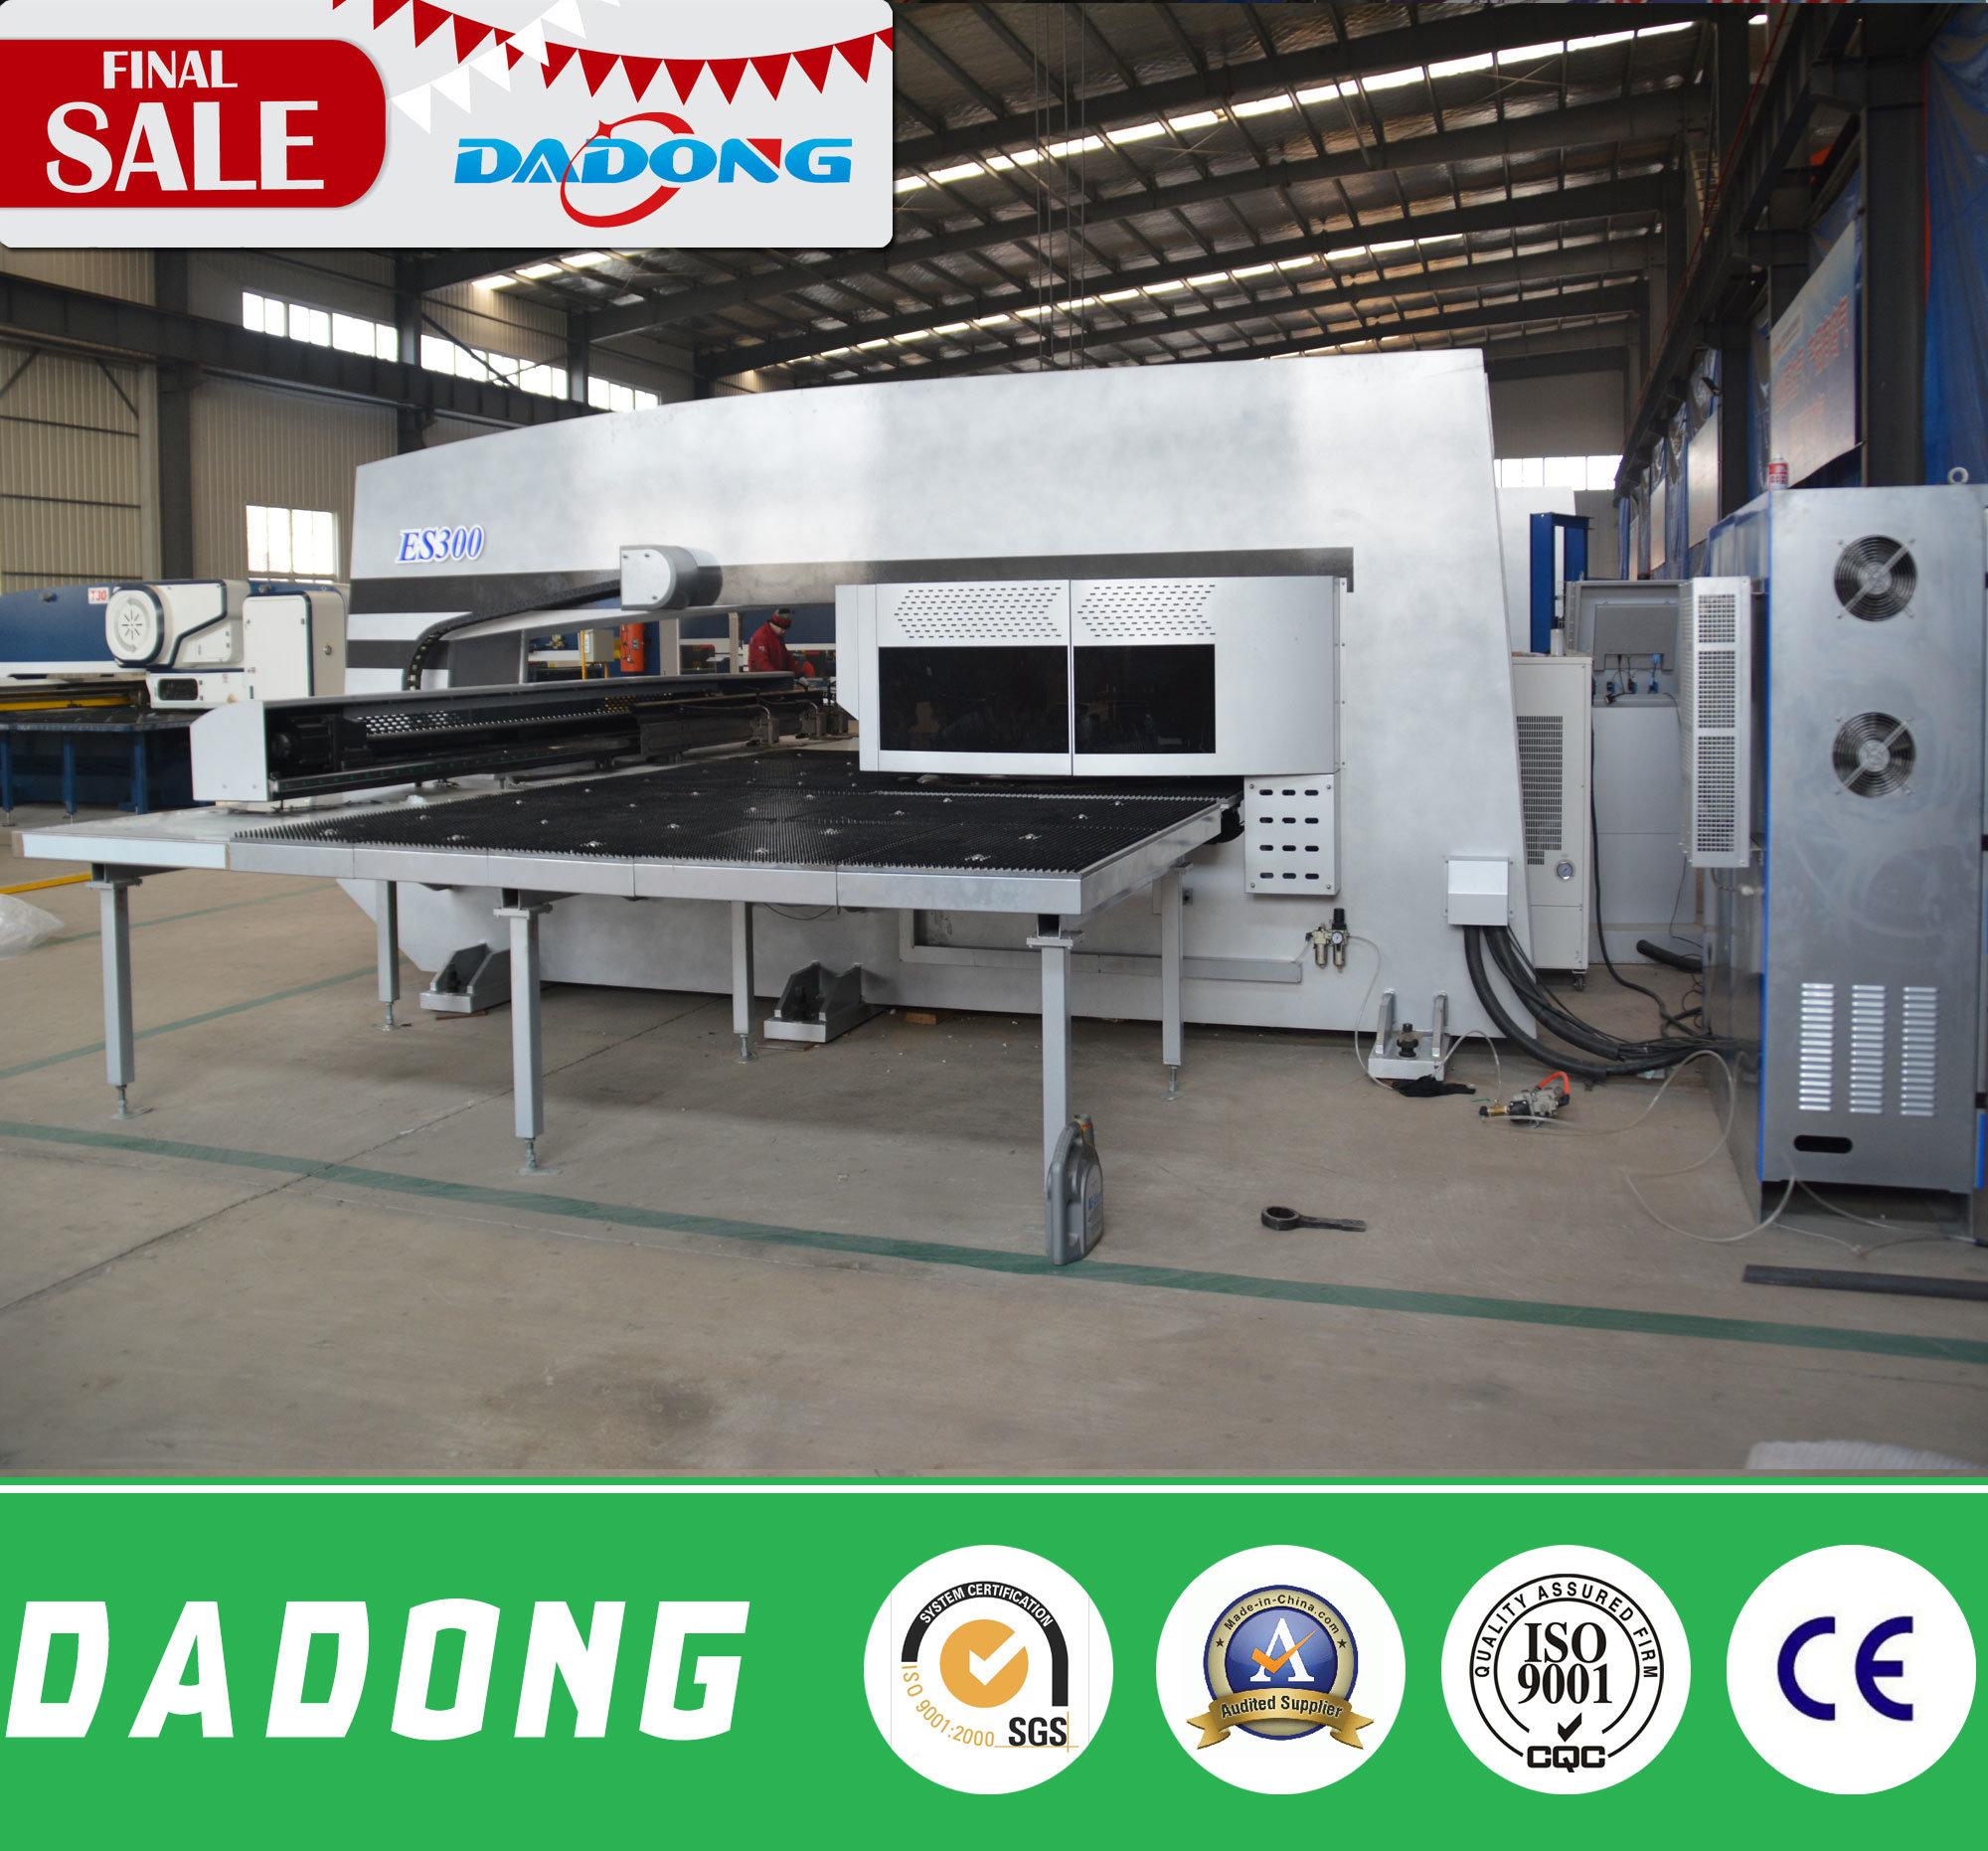 5 Axis CNC Servo Drive Turret Punching Press Machine Es300 Price